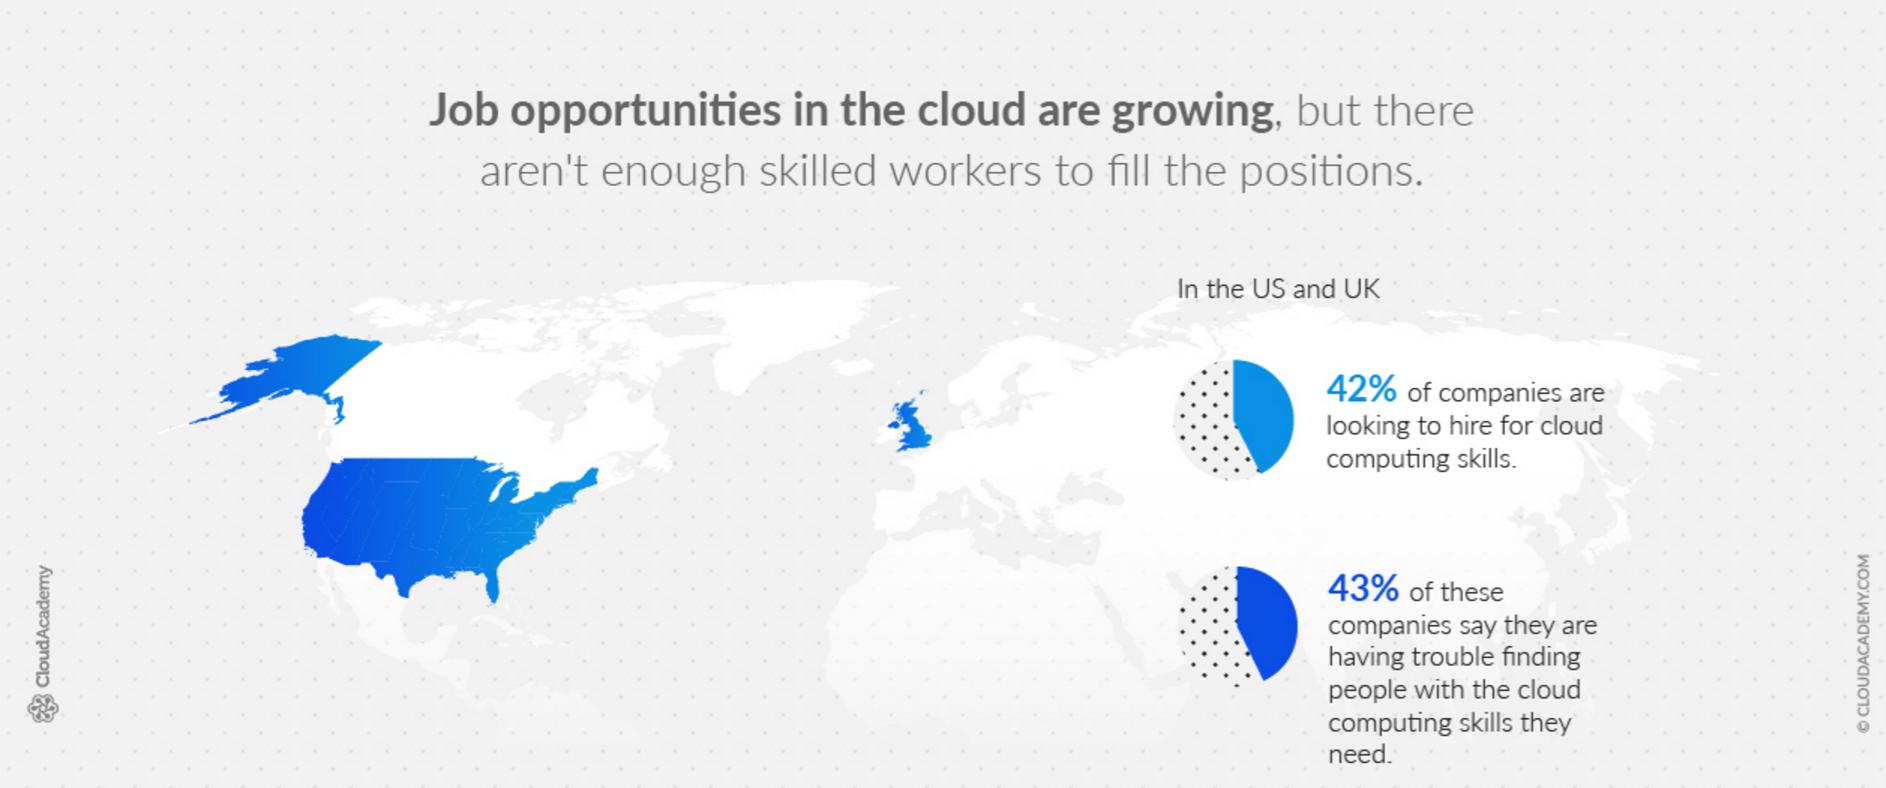 Job opportunities in the cloud